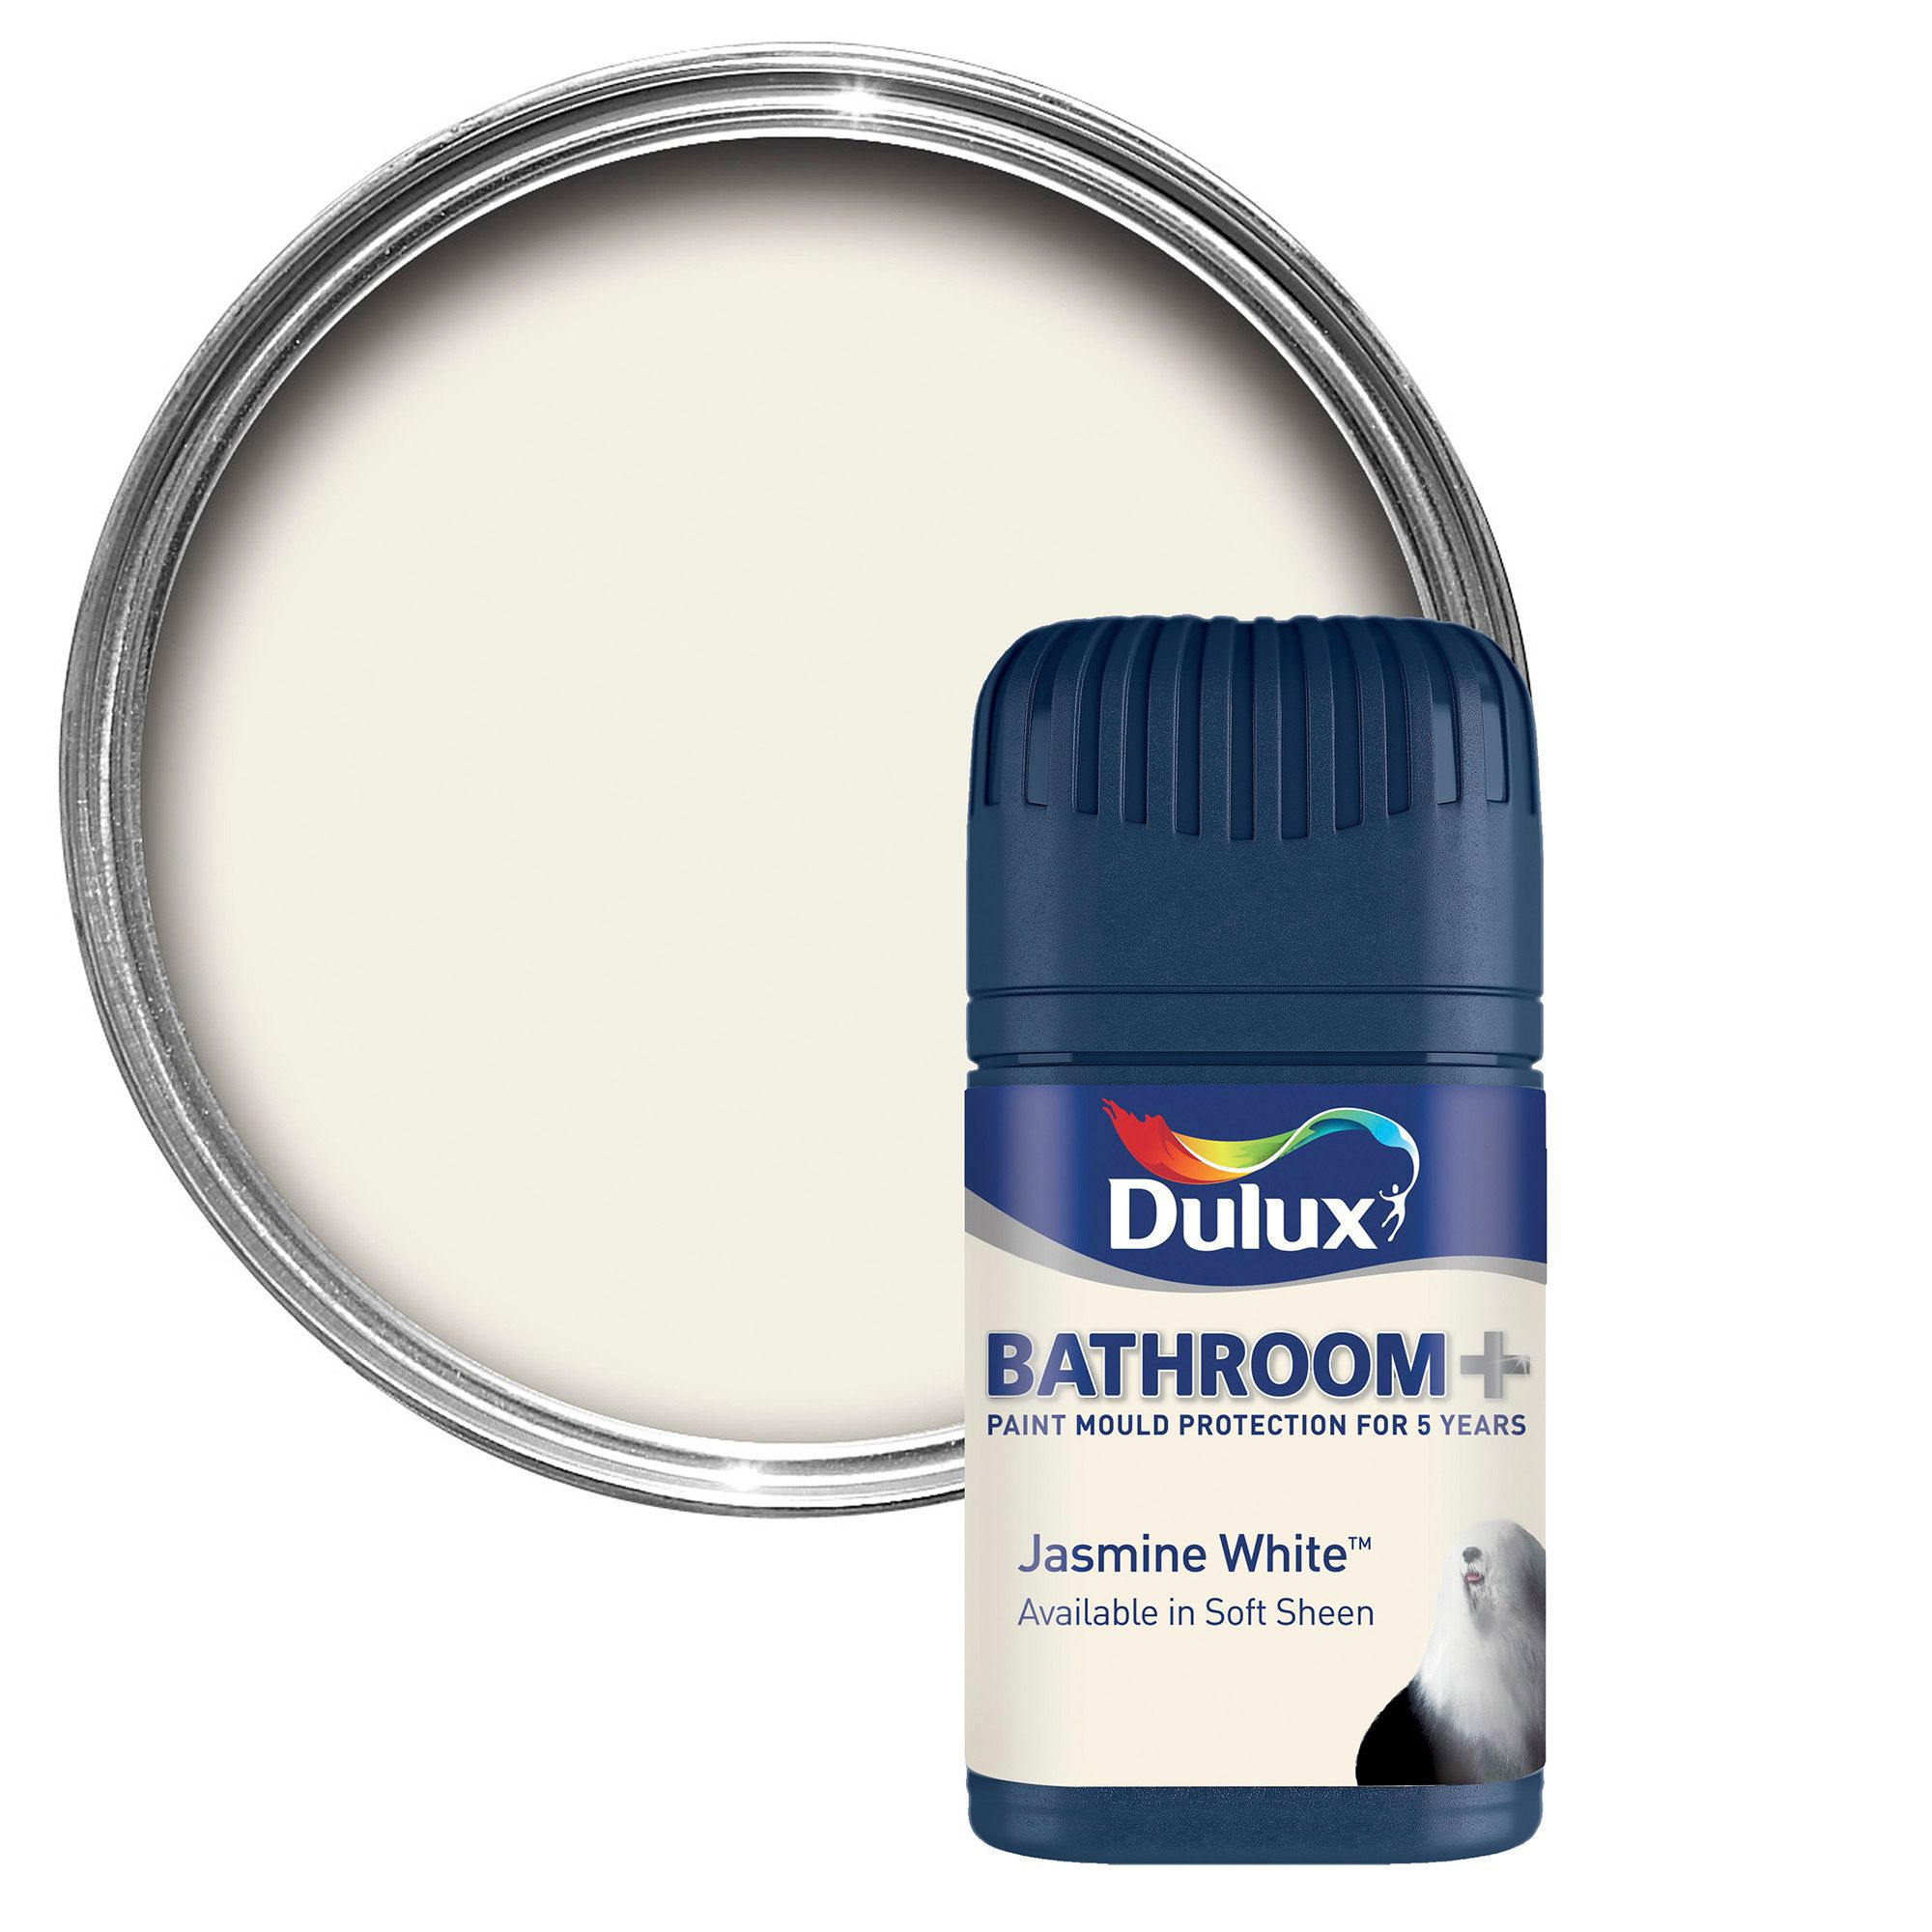 dulux bathroom jasmine white soft sheen emulsion paint 50ml tester pot departments diy at b q. Black Bedroom Furniture Sets. Home Design Ideas